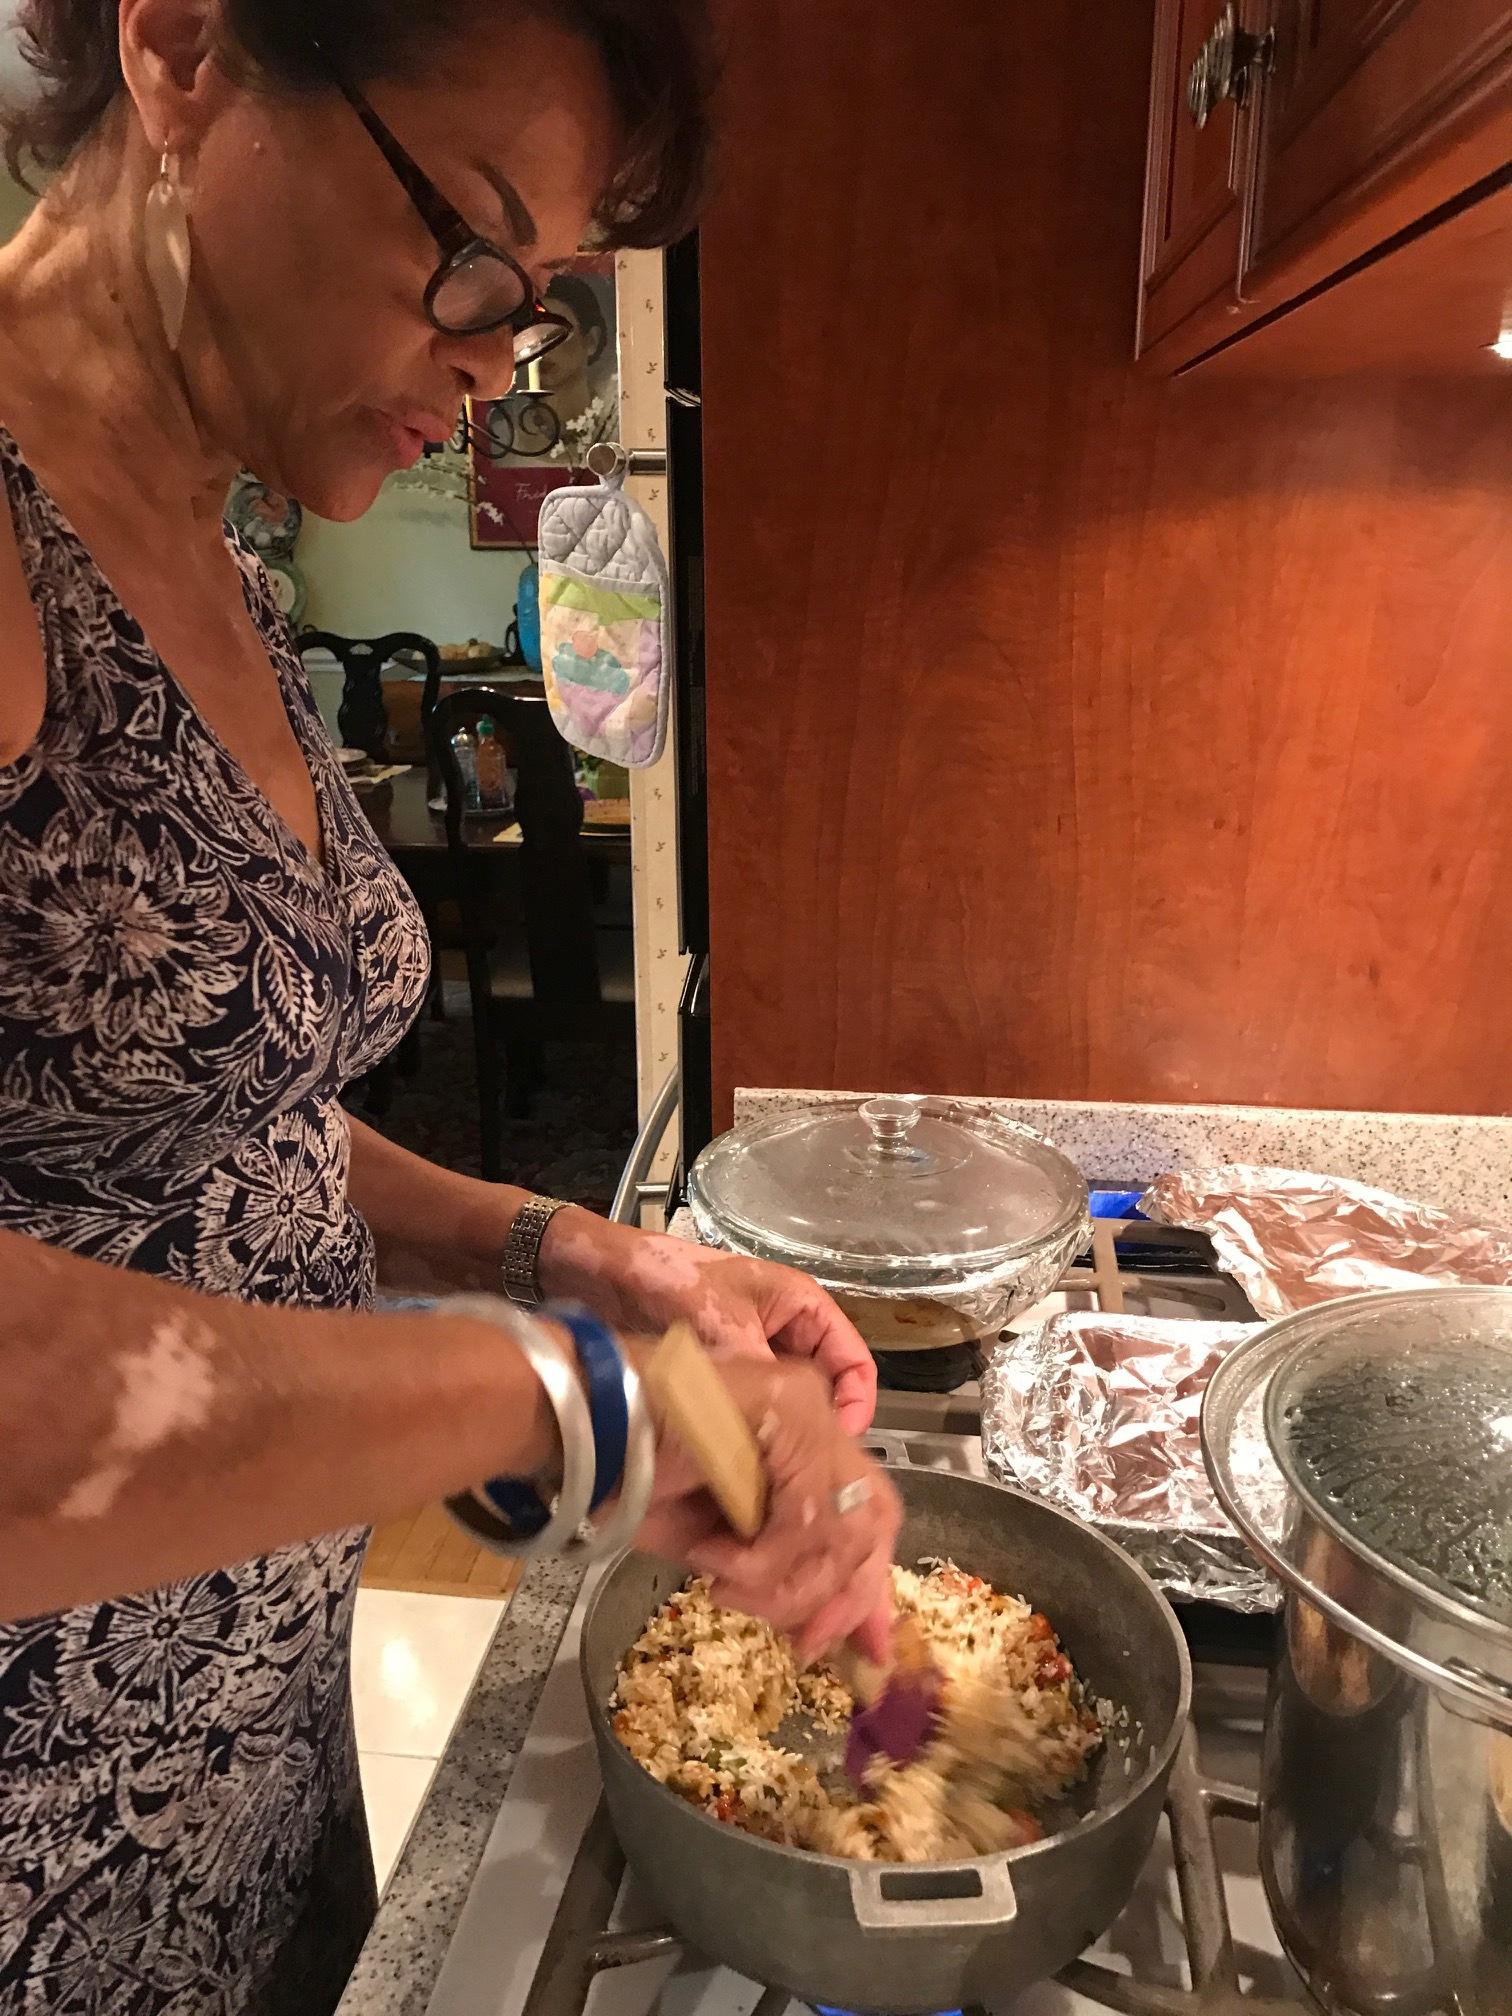 Ita stirring the rice and Sazon together